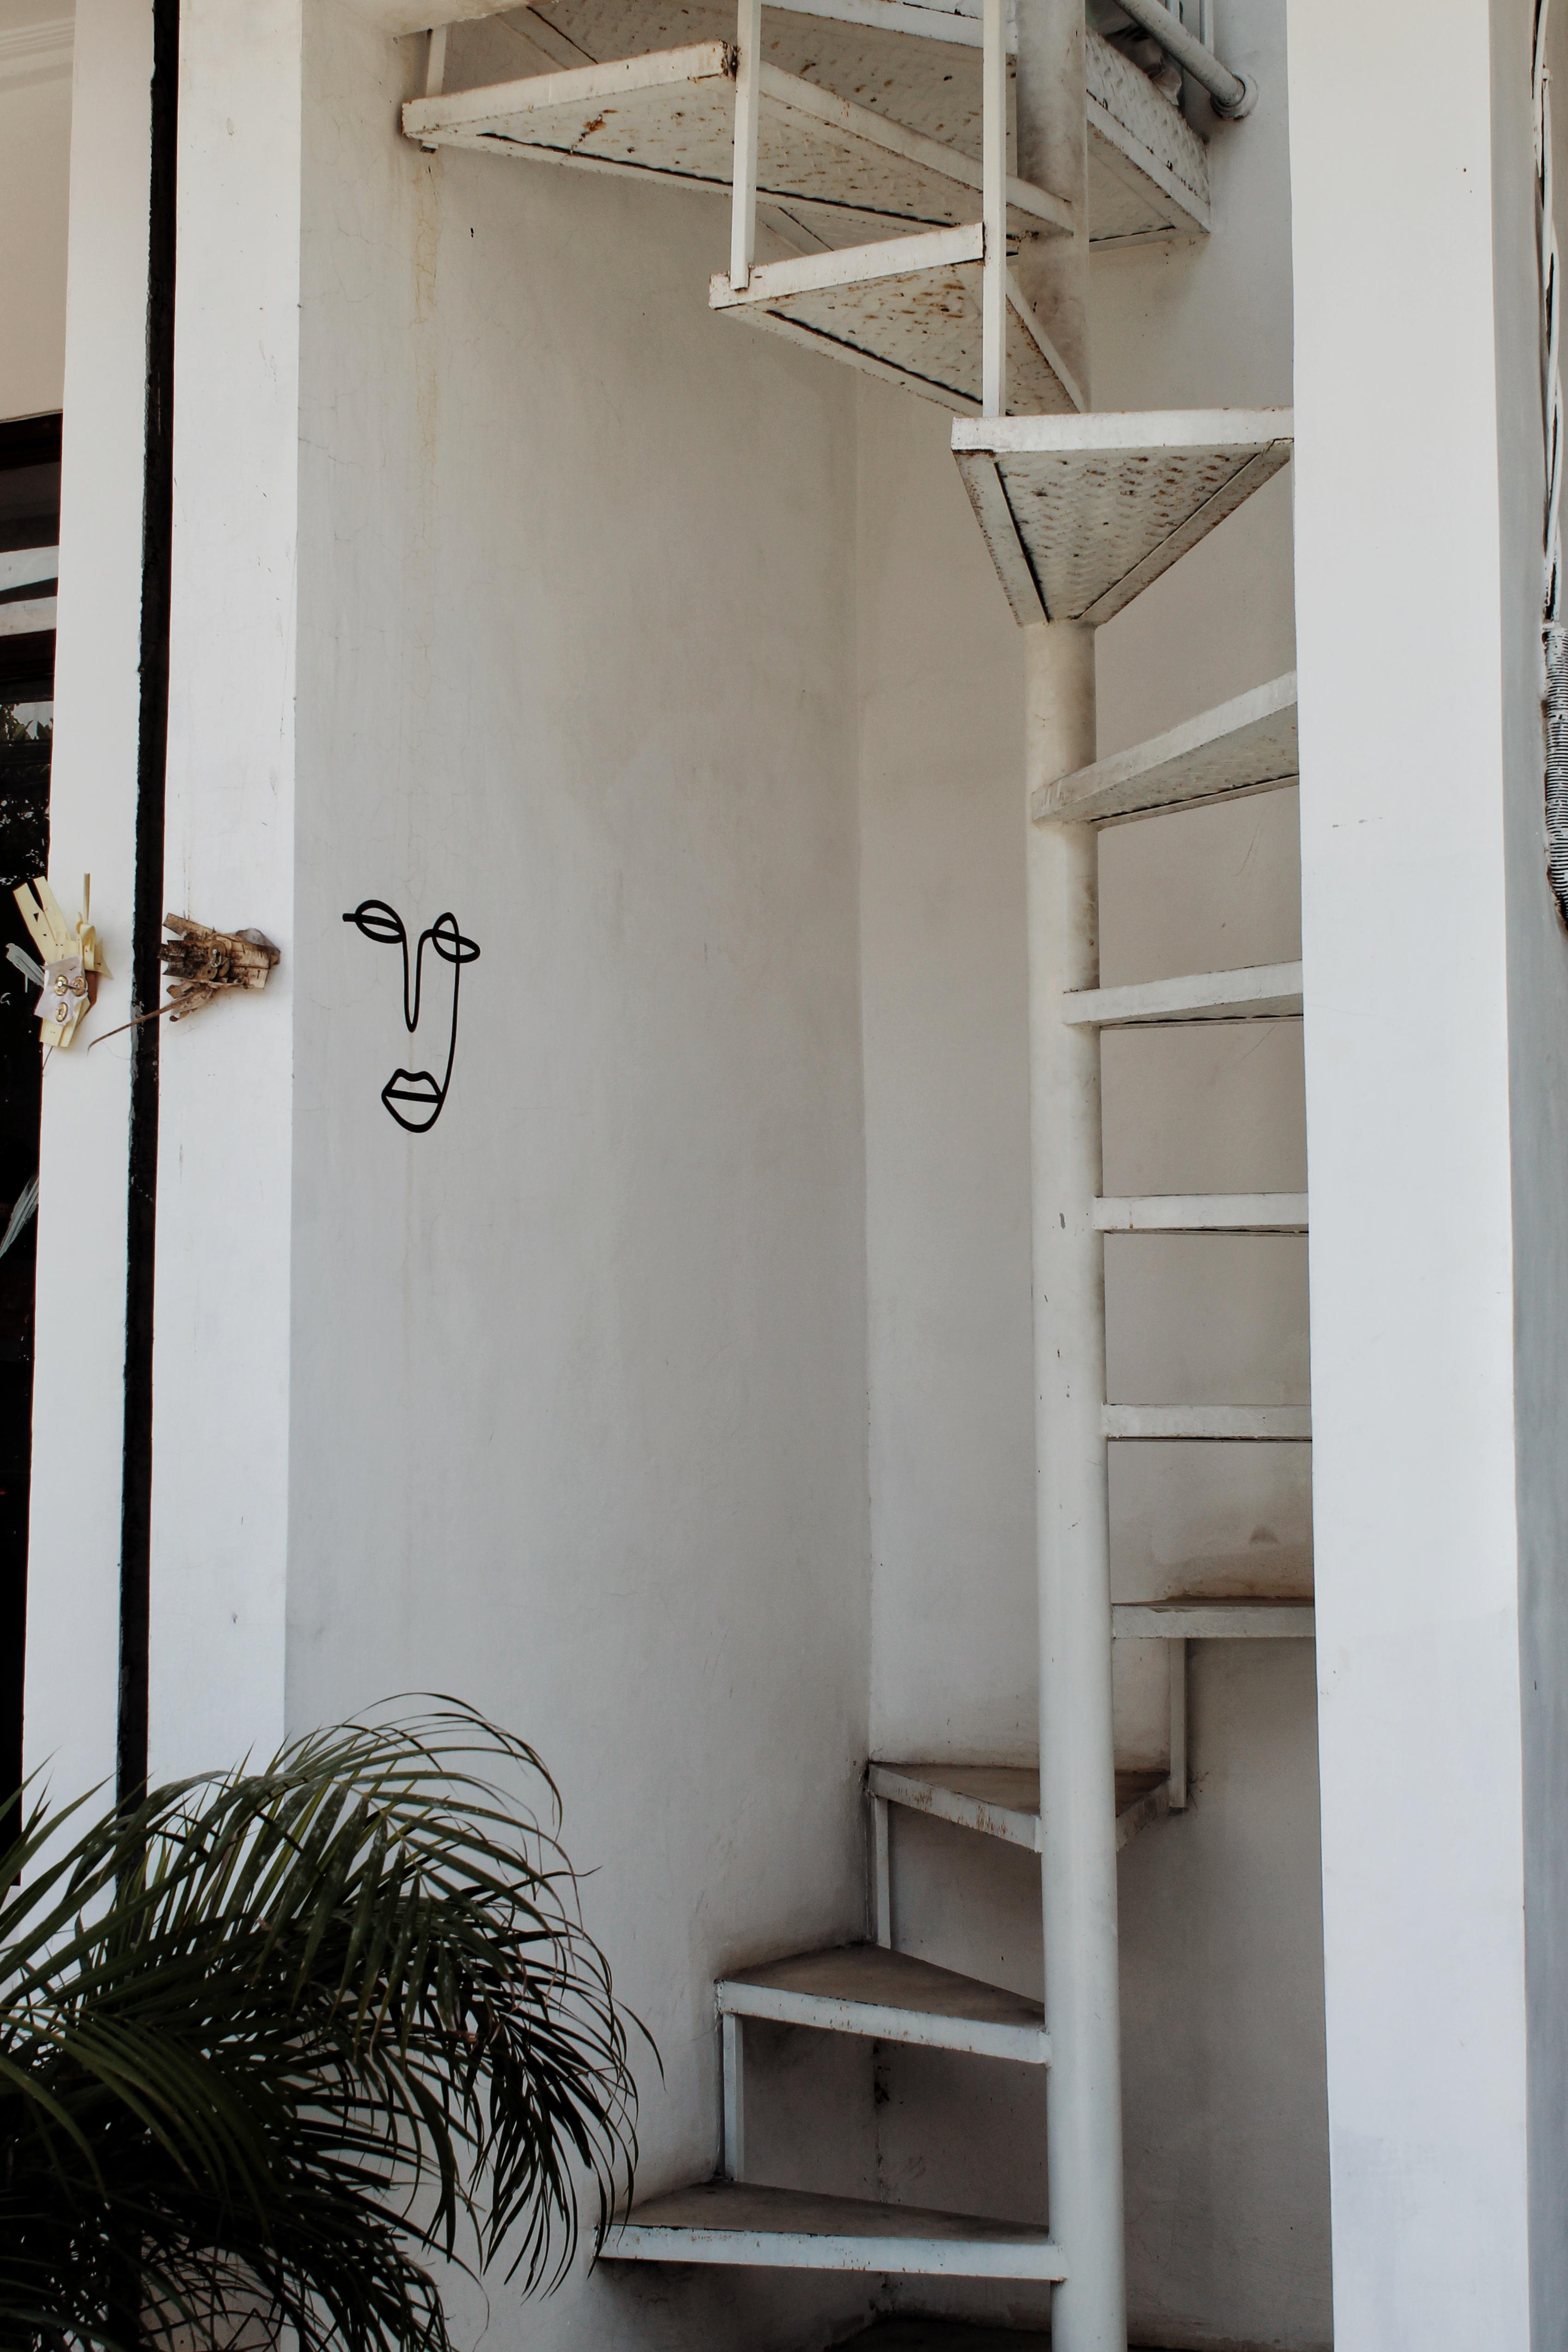 minimal art on wall and stairs in canguu bali